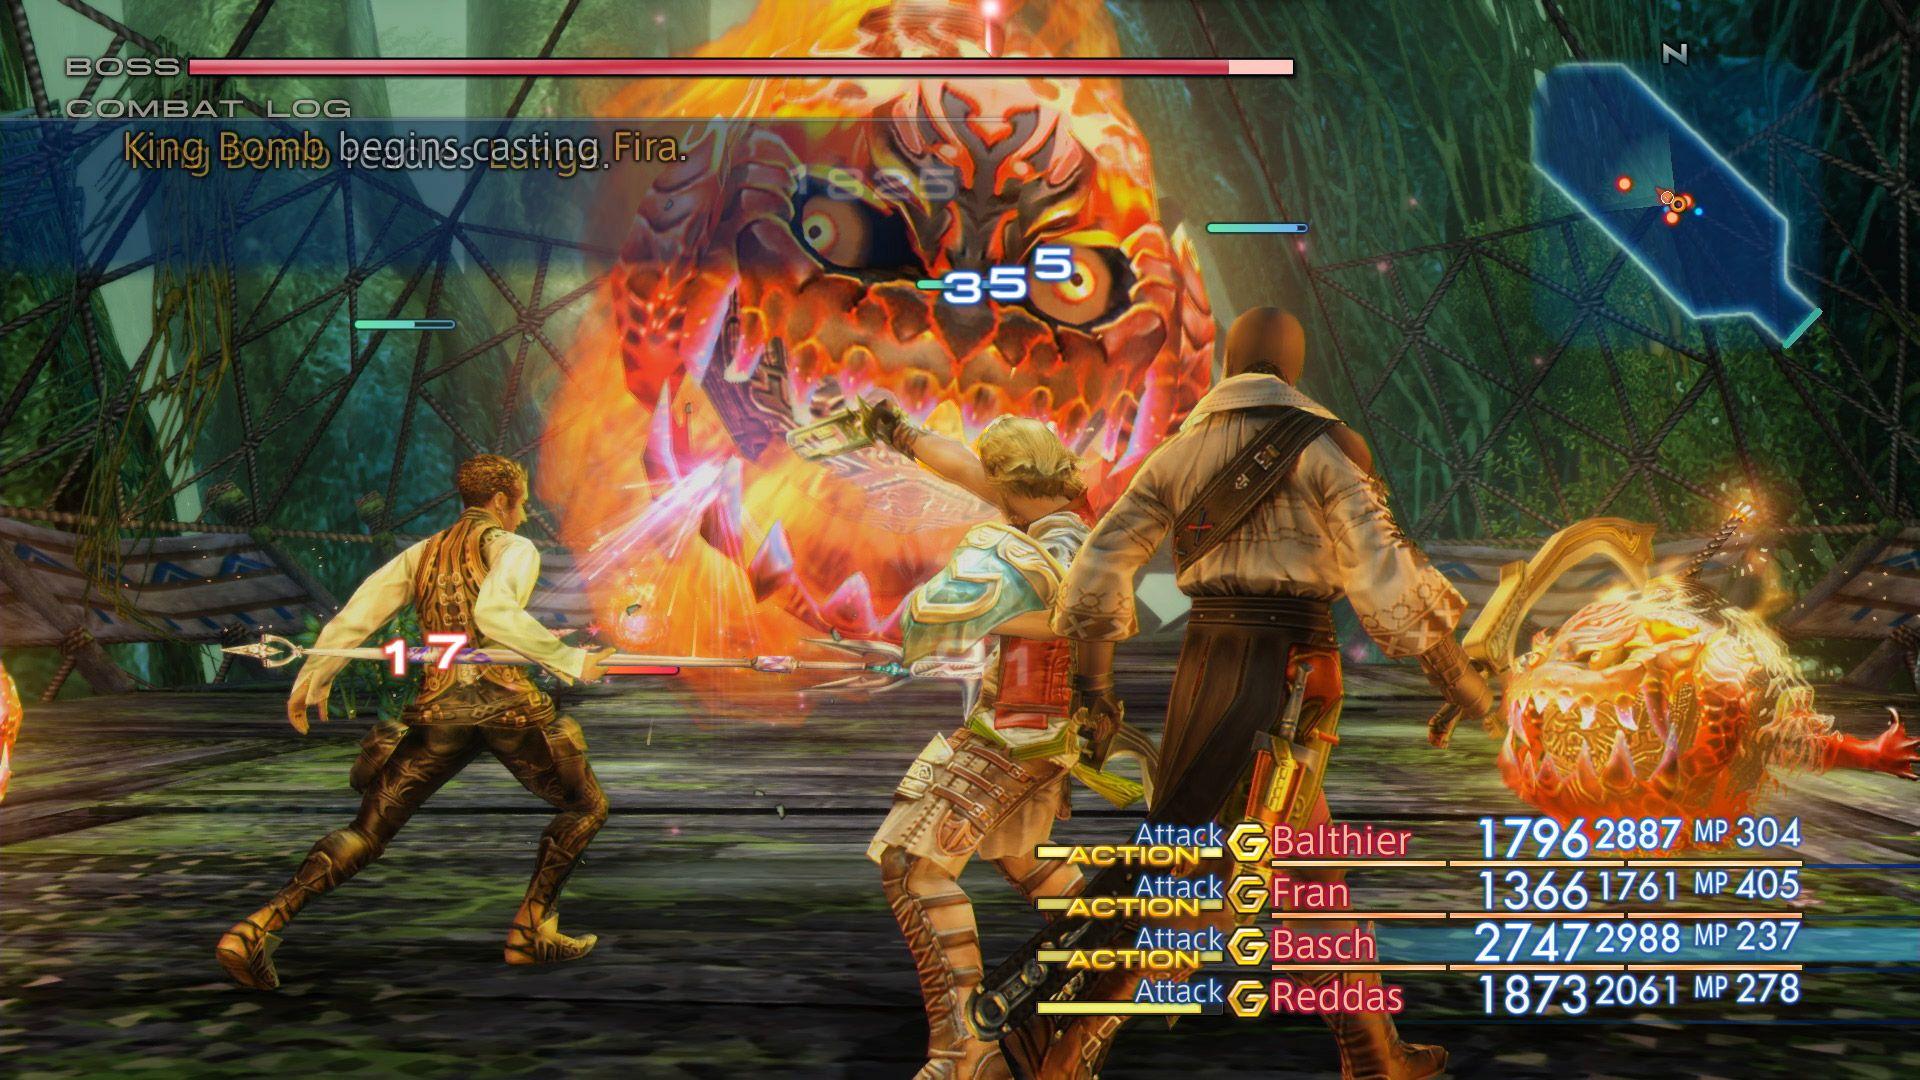 FINAL FANTASY® XII THE ZODIAC AGE [XBOX ONE] | Square Enix Store